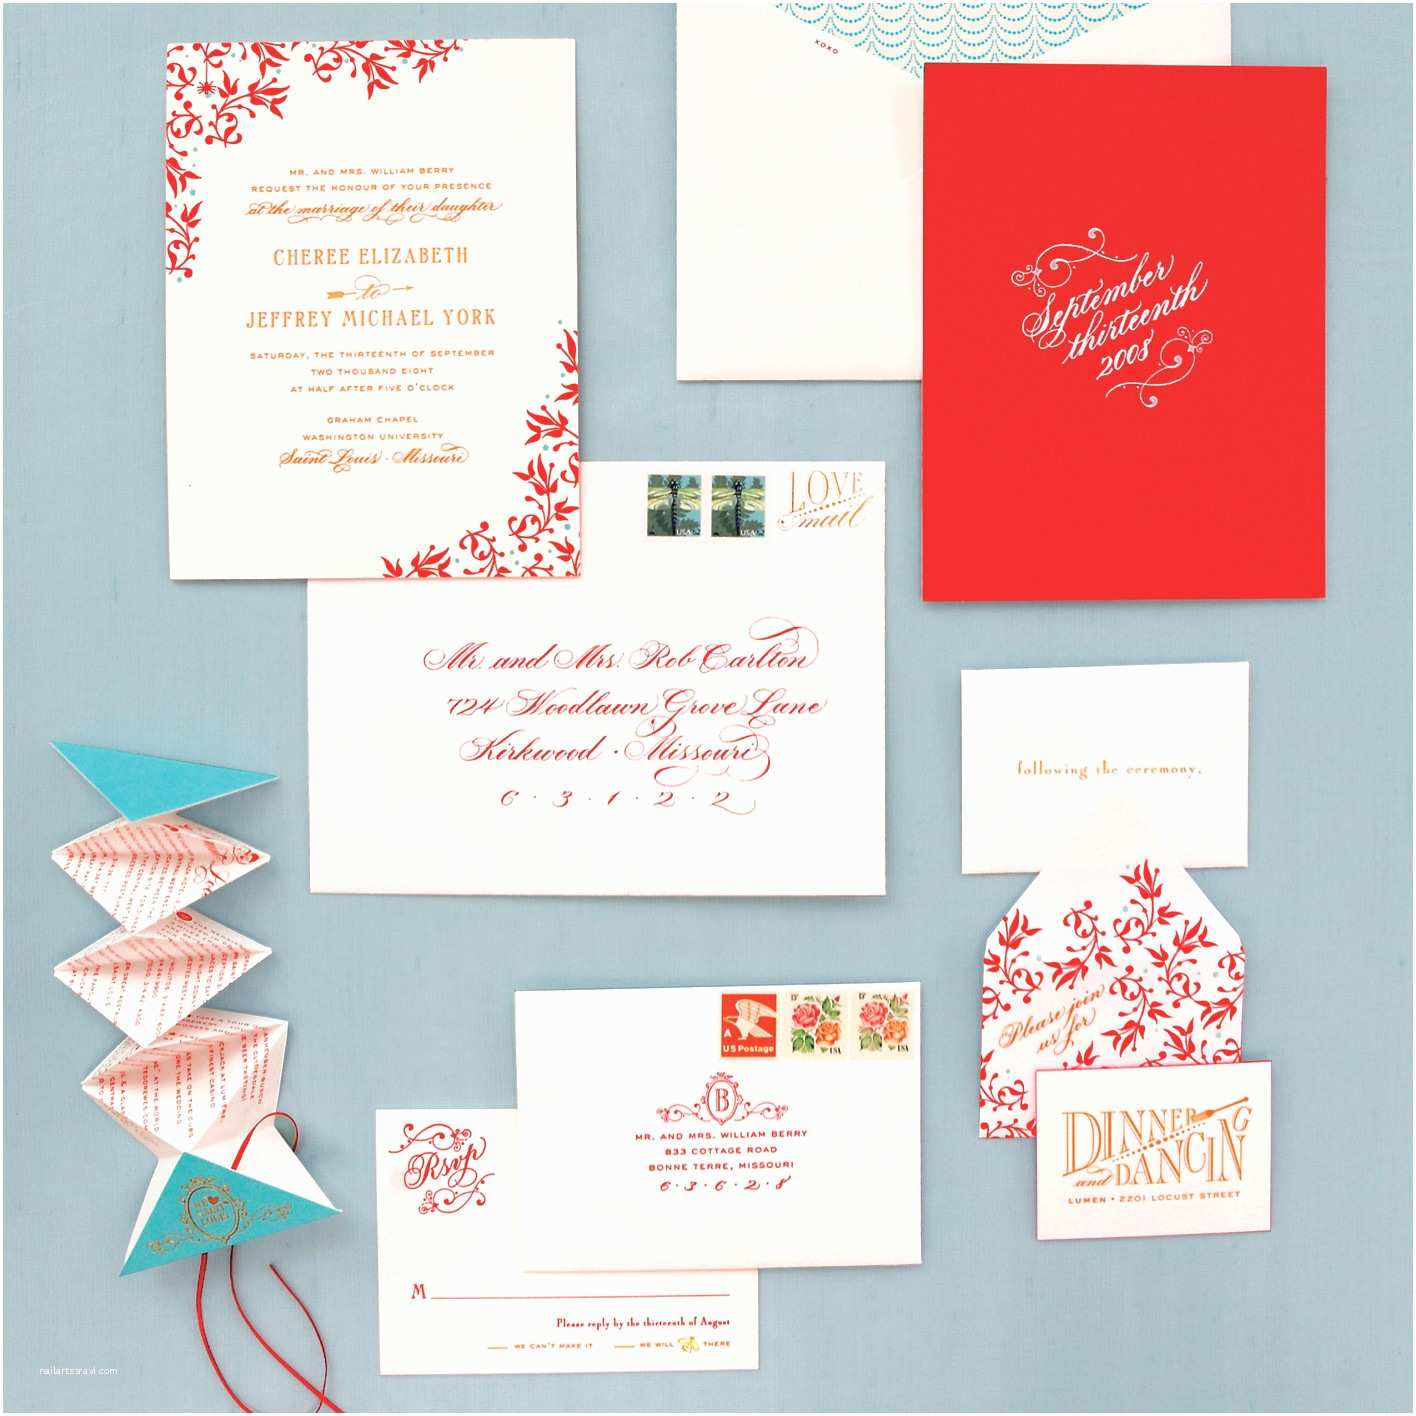 Envelope Etiquette For Wedding Invitations Wedding Invitation Envelope Etiquette –